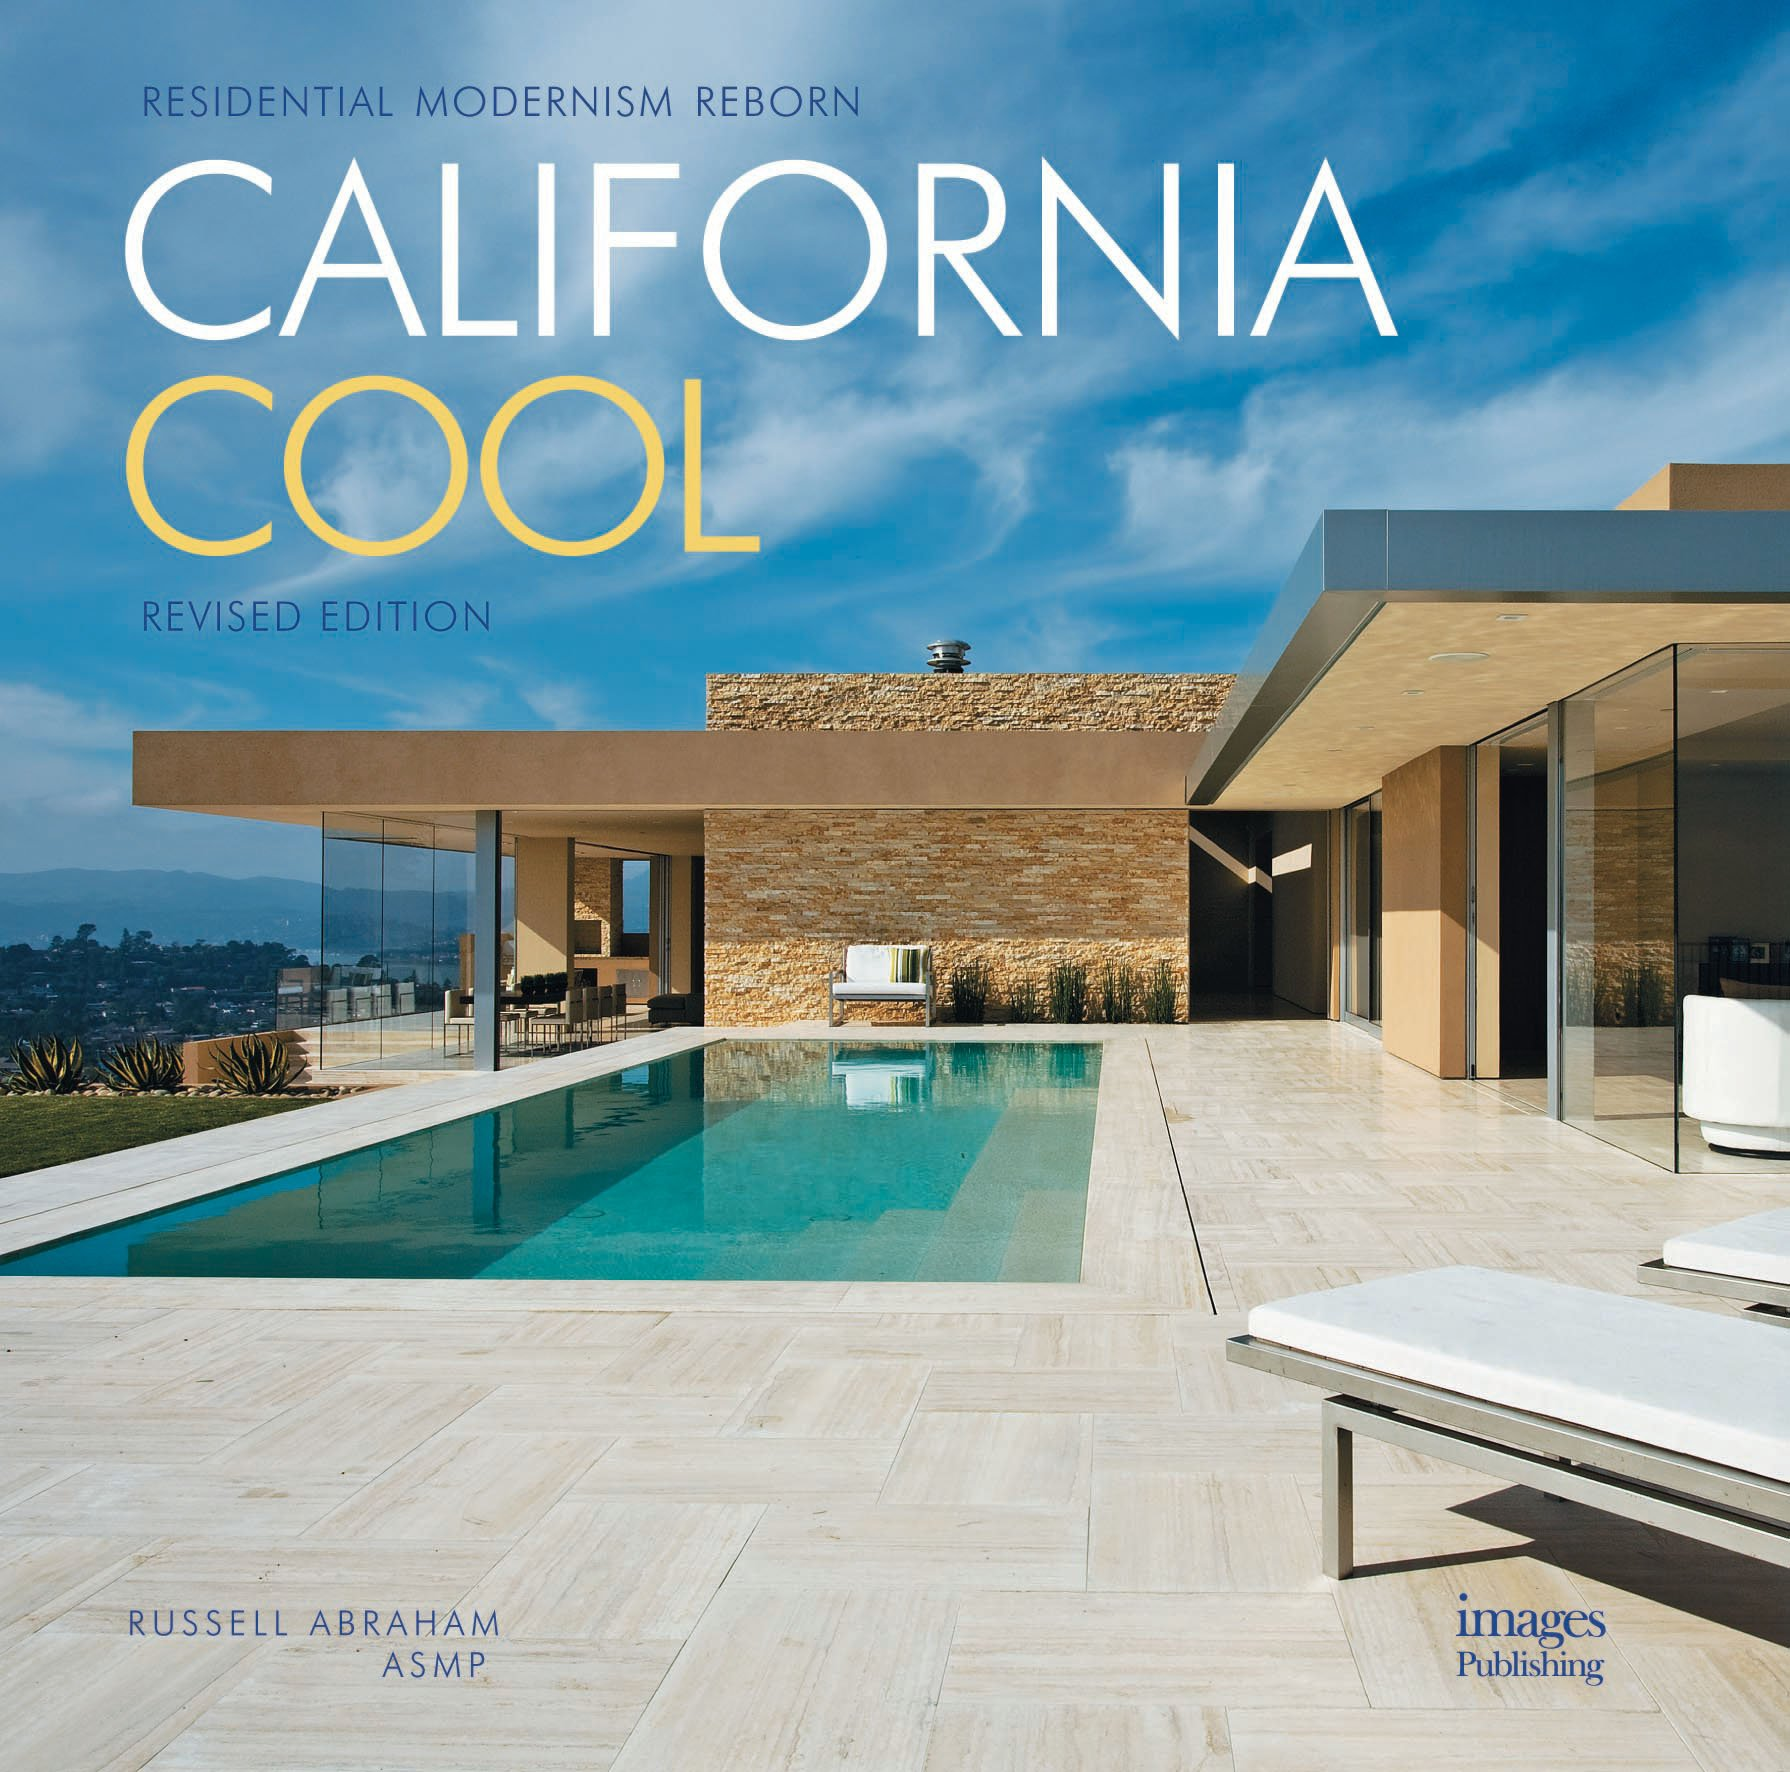 Download California Cool: Residential Modernism Reborn Text fb2 book